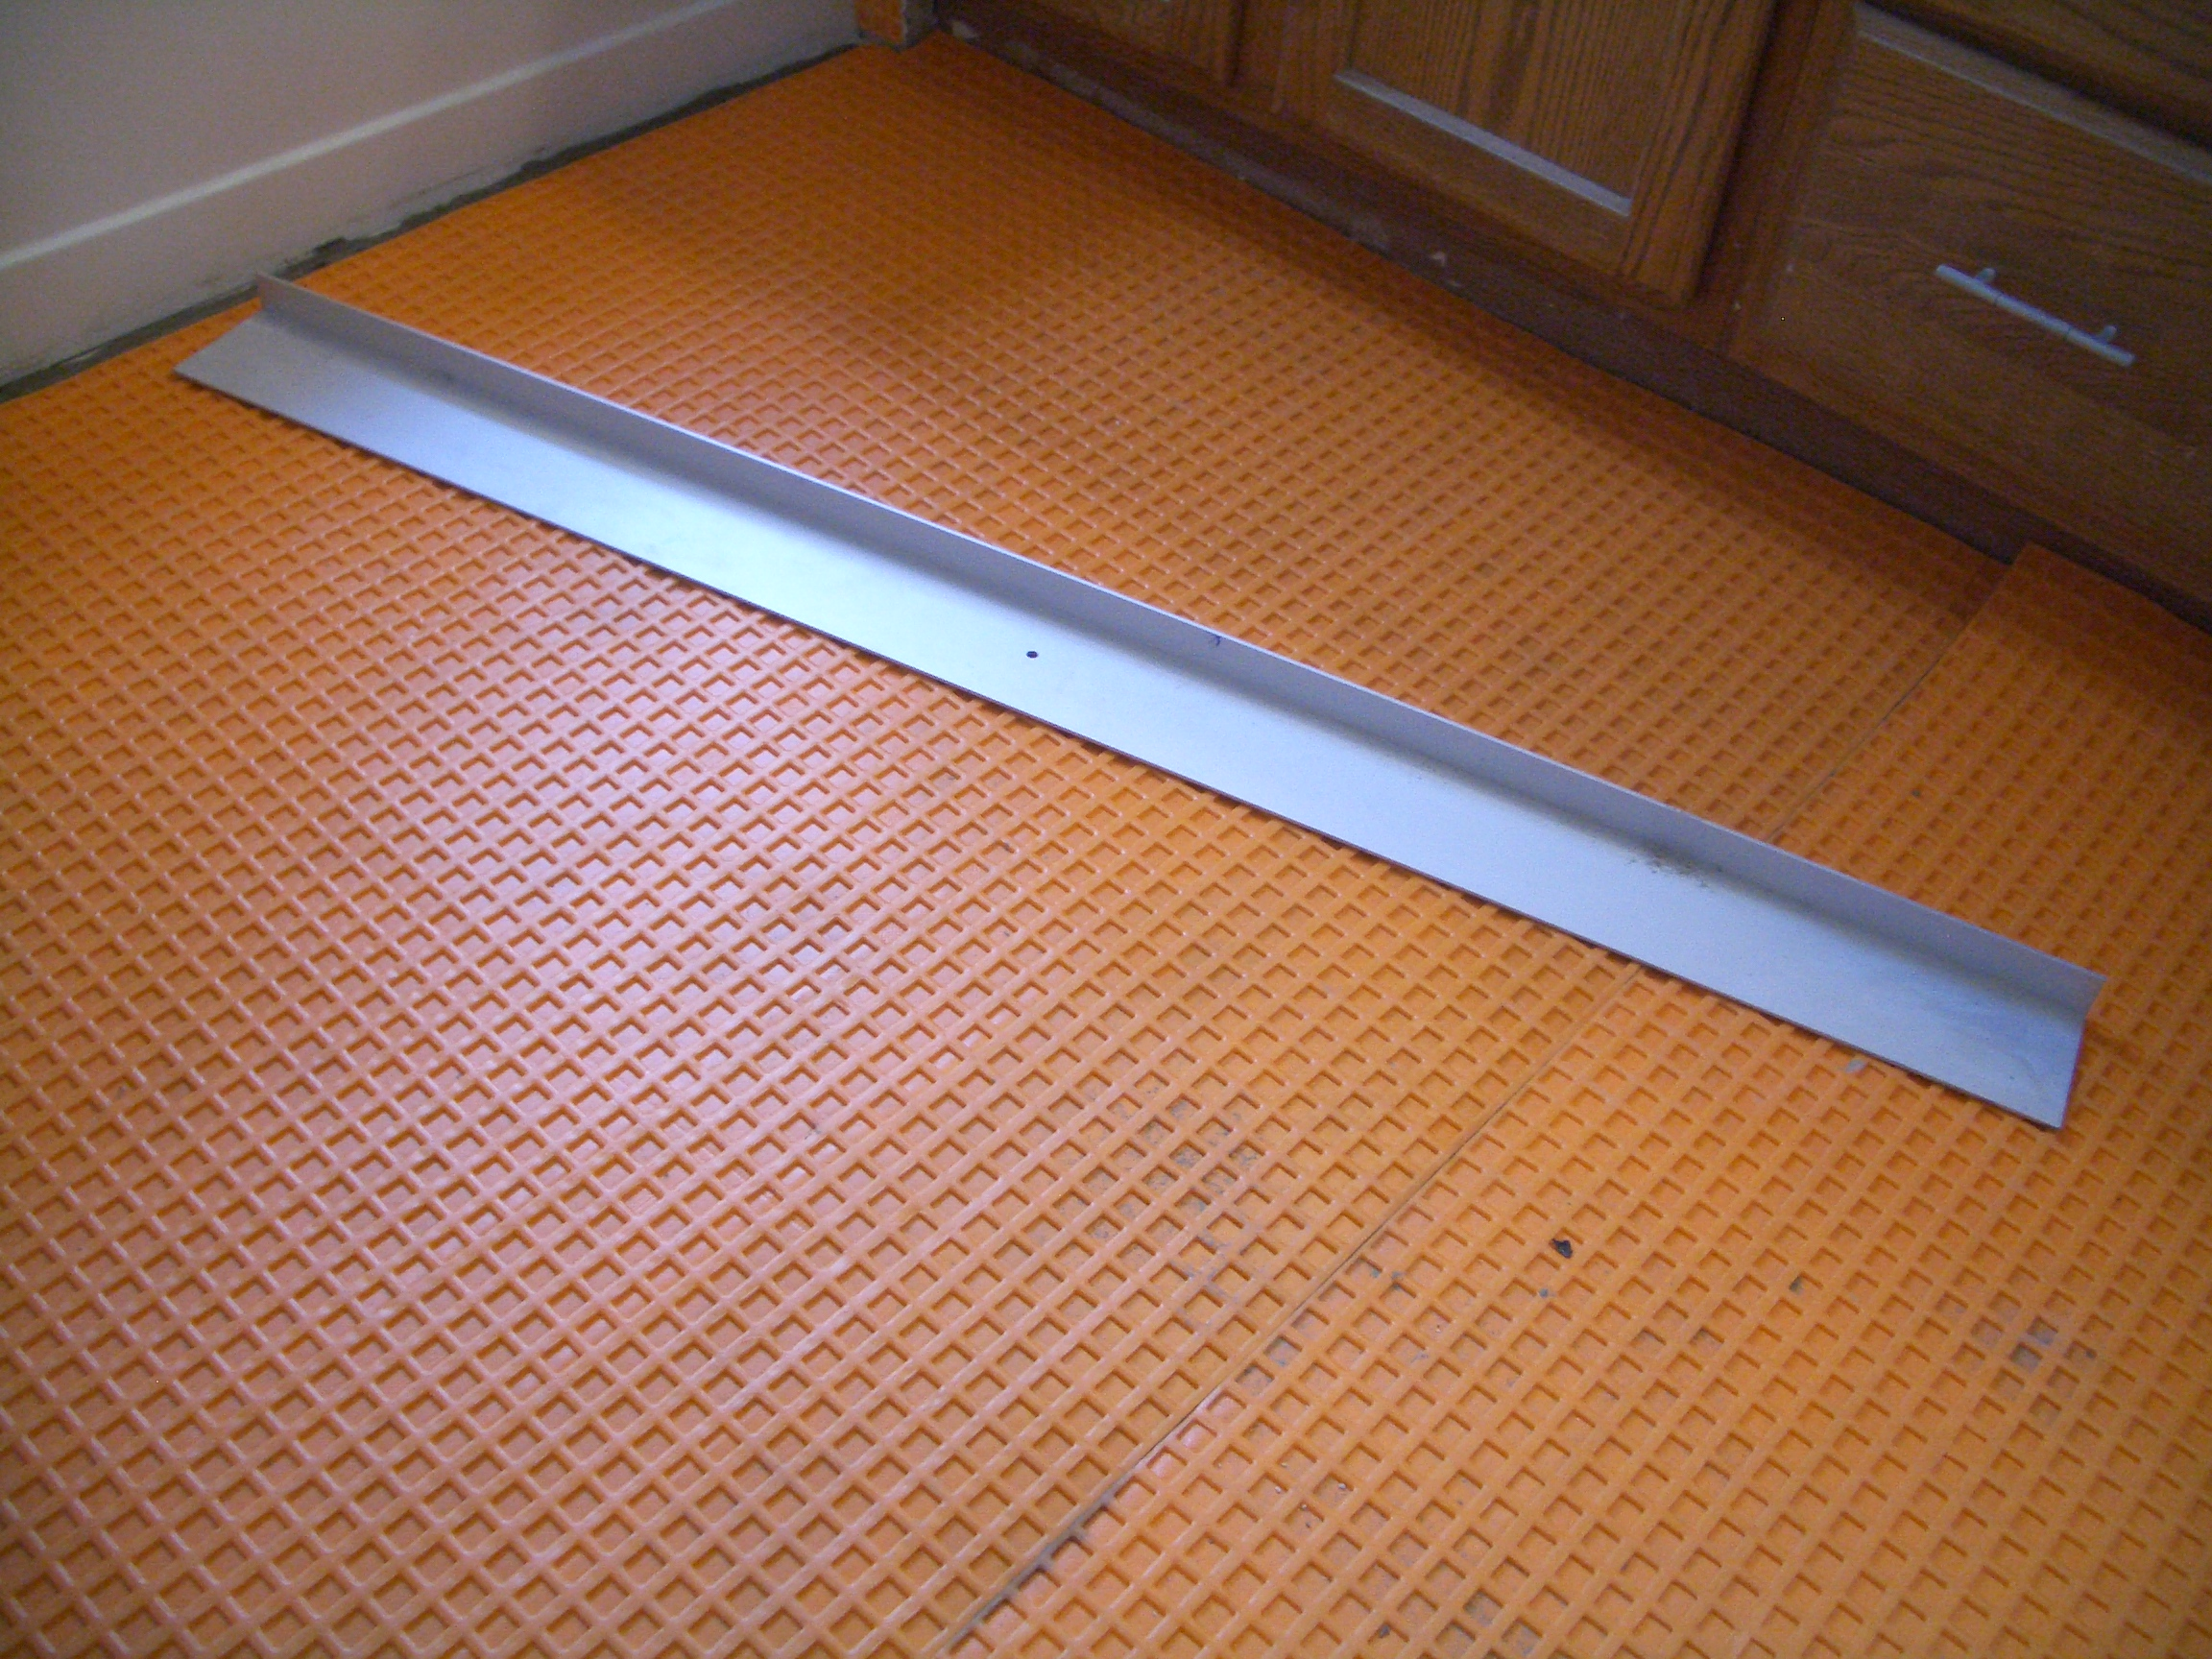 home bathroom custommade concrete pan mats com garden search custom floor mat shower showers